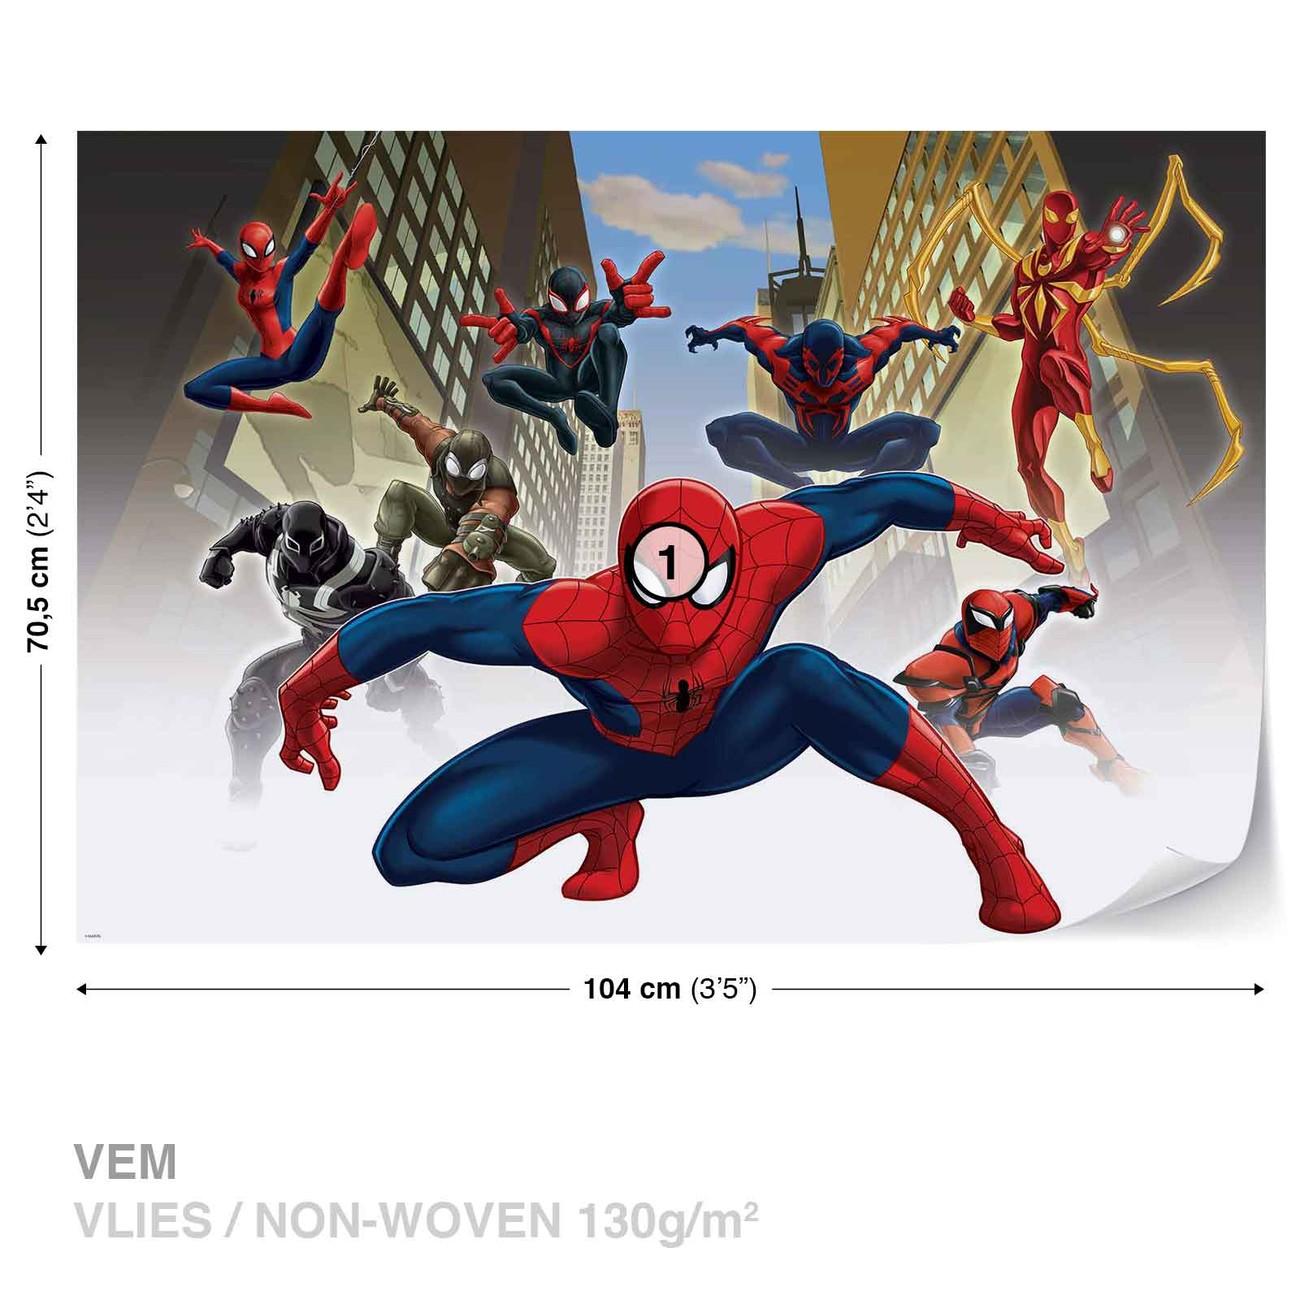 Spiderman marvel wall paper mural buy at - Poster mural spiderman ...